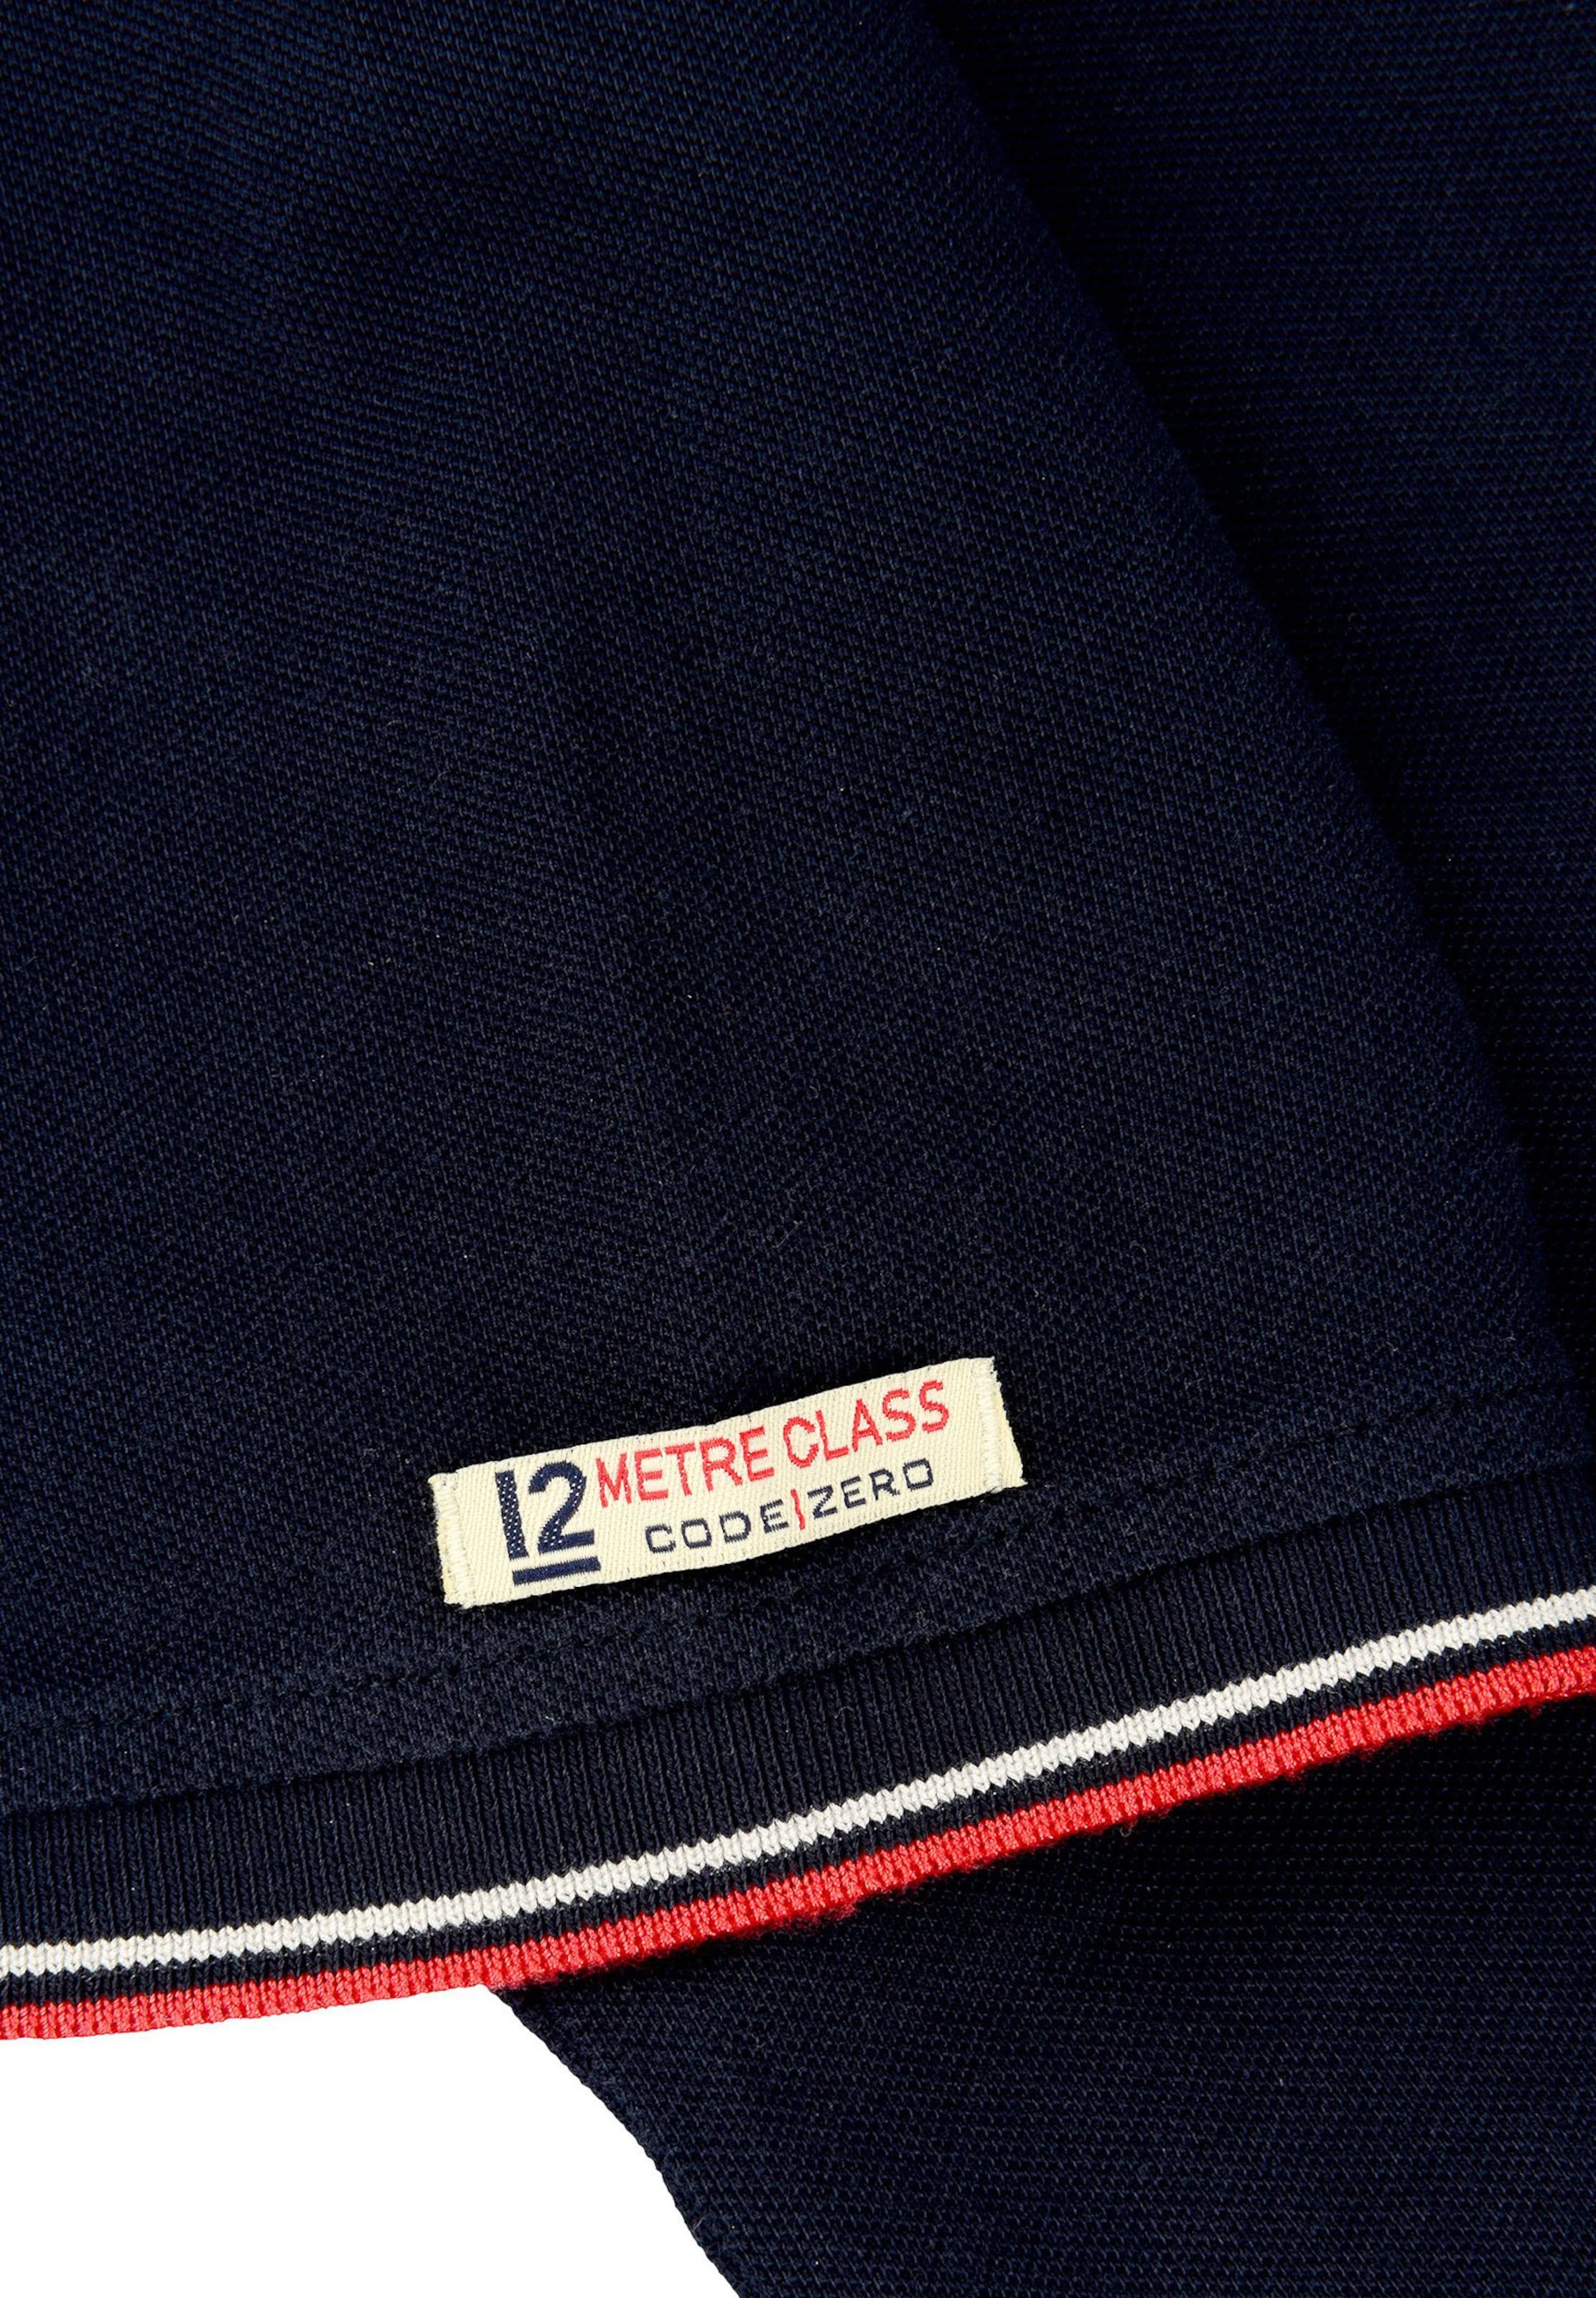 Weiß Code Ultramarinblau zero Polo 12m Newport' 'ss In BlauMarine TJl1c3FKu